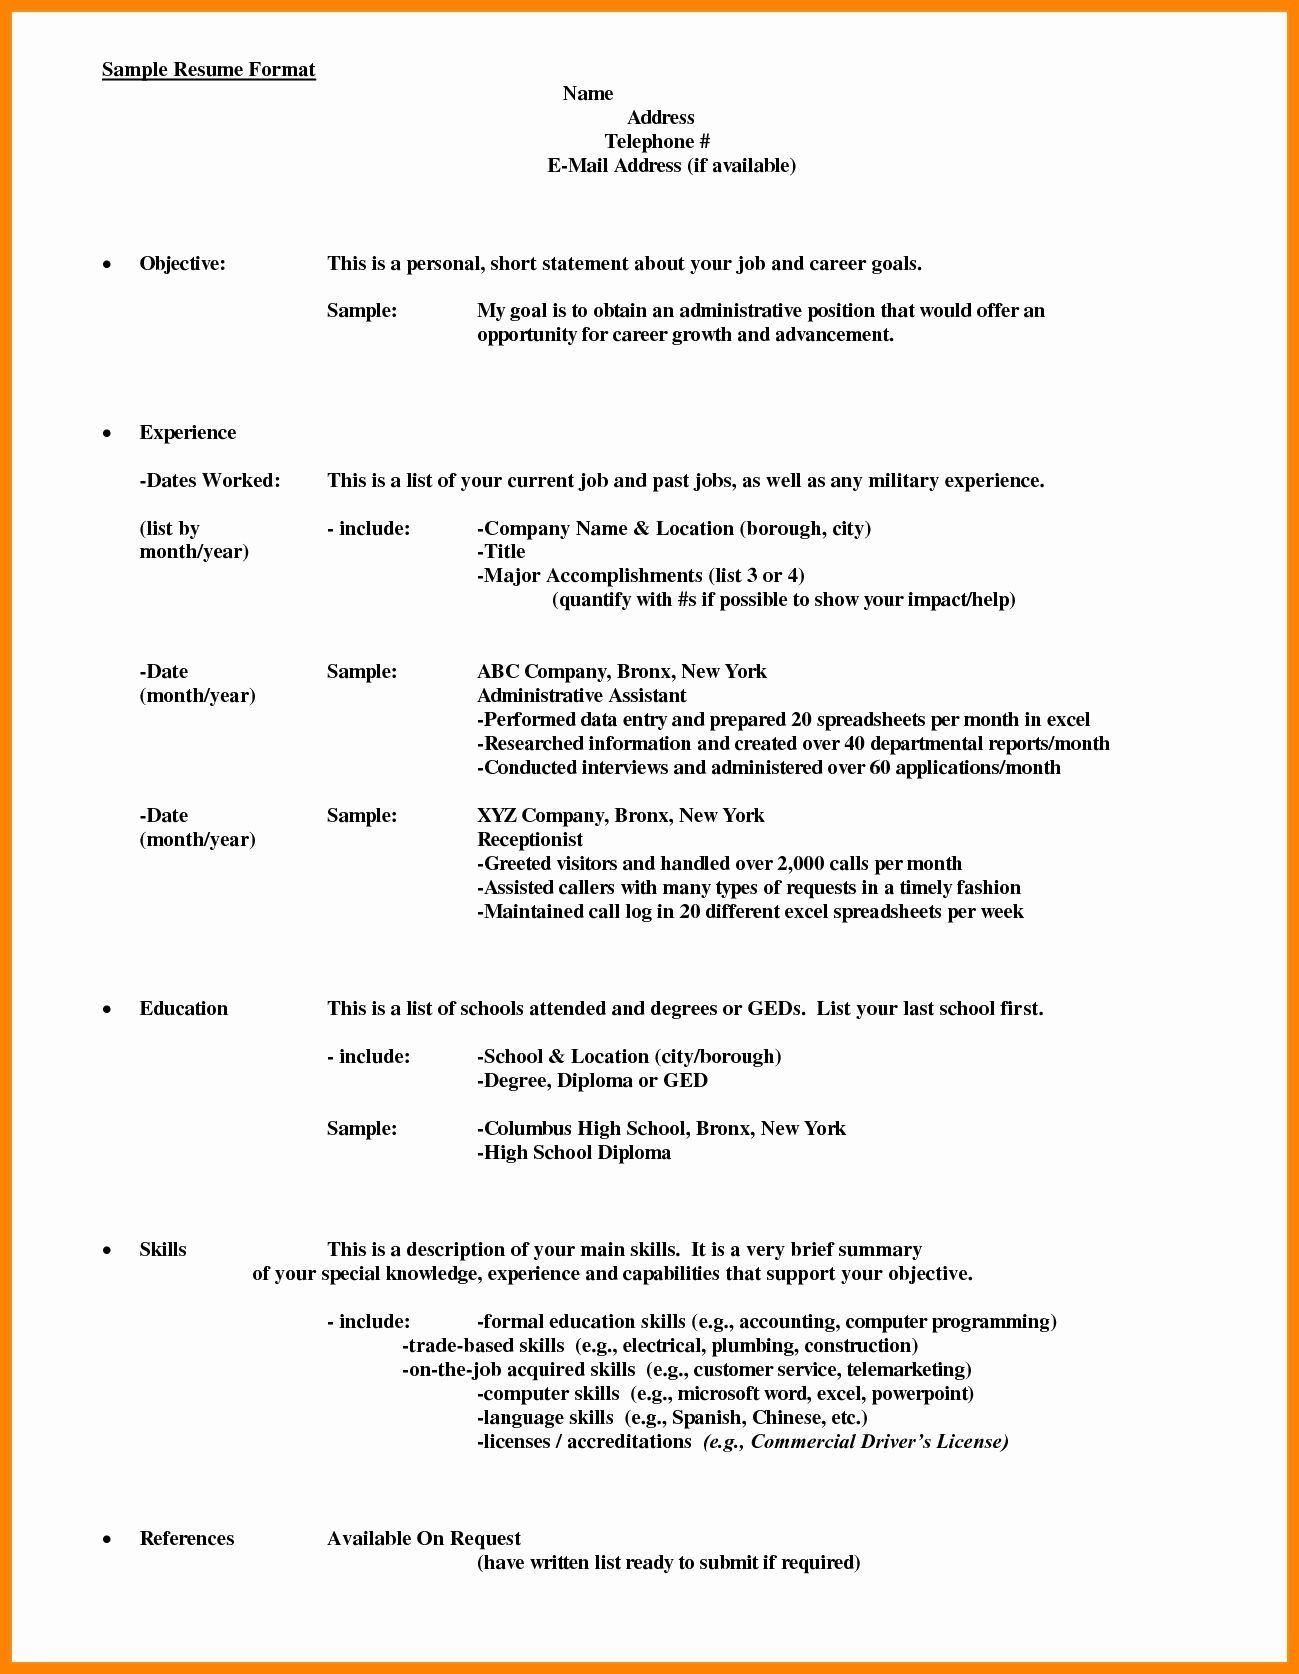 Resume Format Dates Resume Templates Resume Format Chronological Resume Template Resume